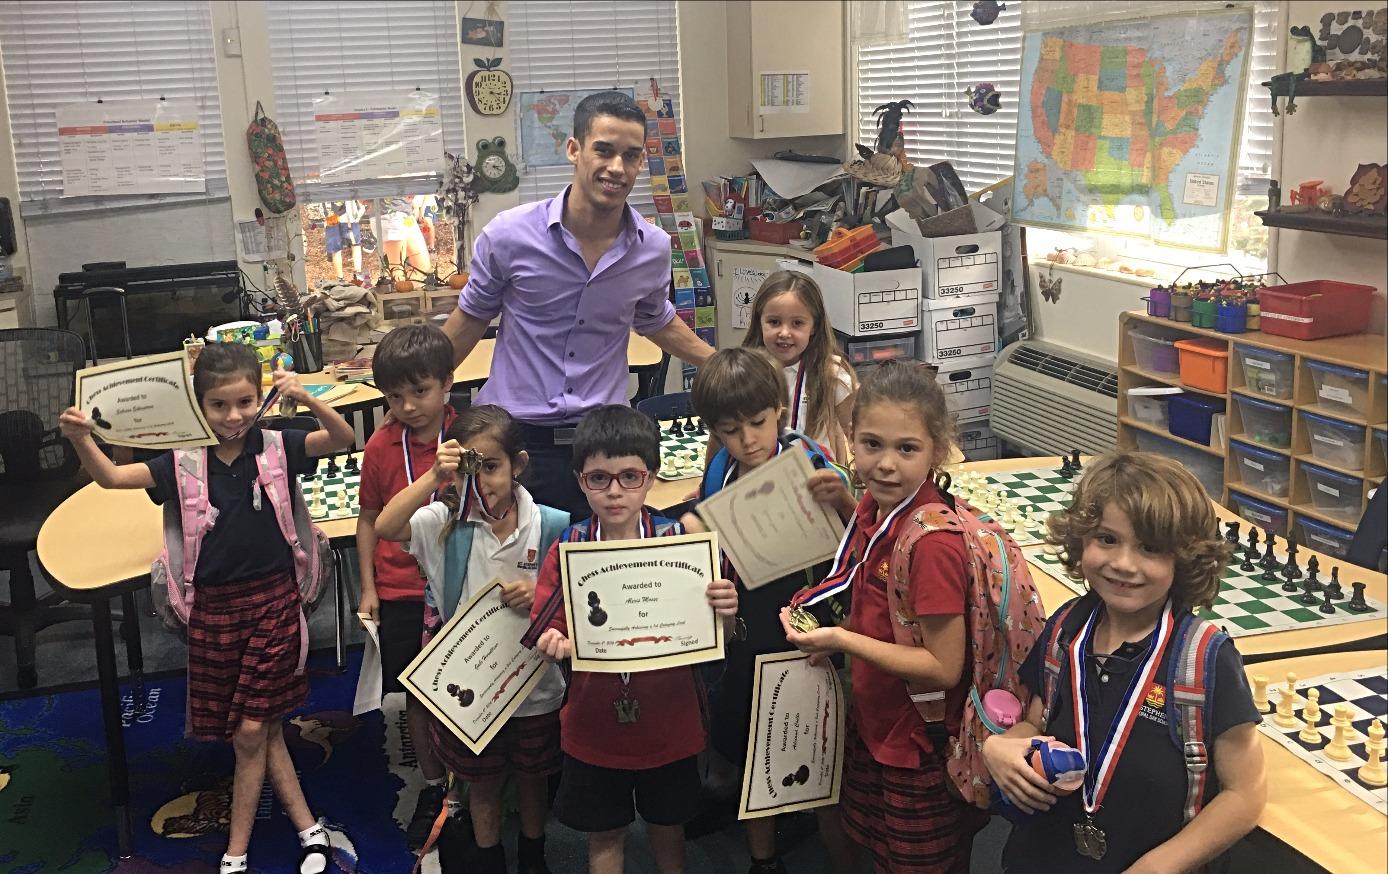 Chess club at Saint Stephen's Episcopal Day School